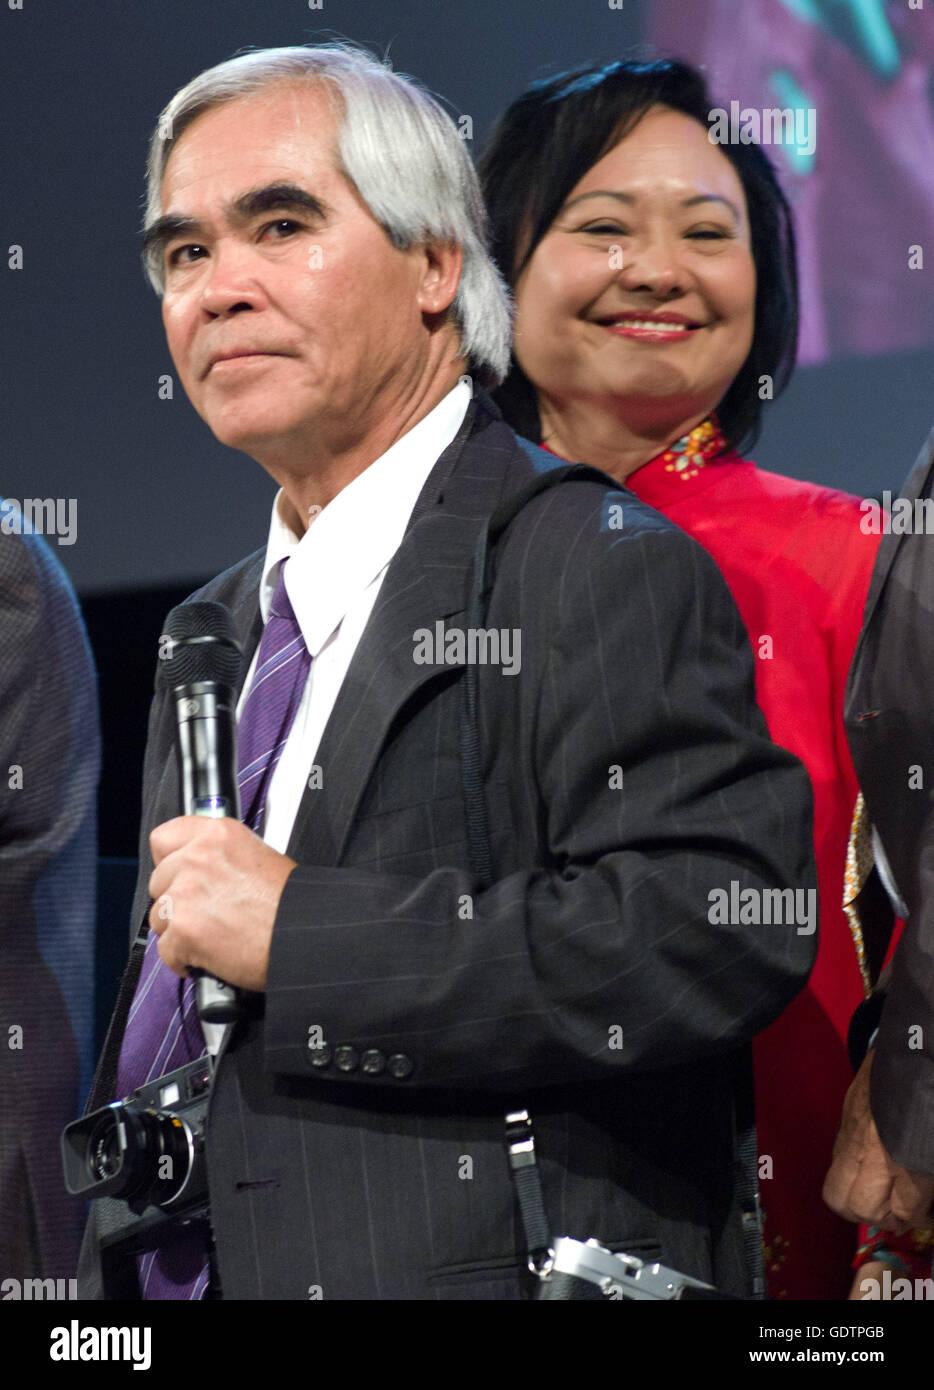 Nick Ut and Kim Phuc - Stock Image